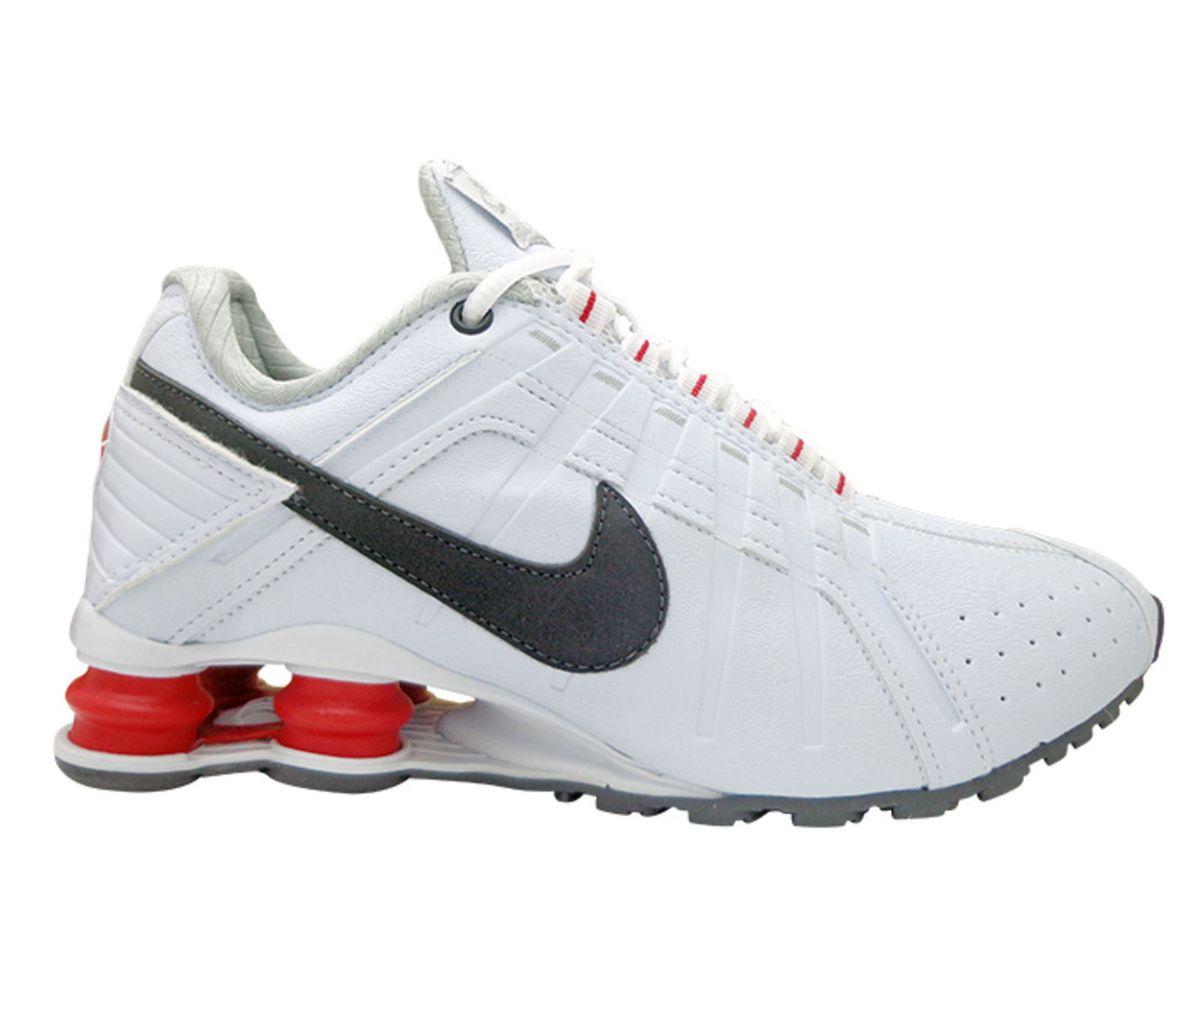 best sneakers eeb39 81649 tênis nike shox junior branco e vermelho - tênis nike